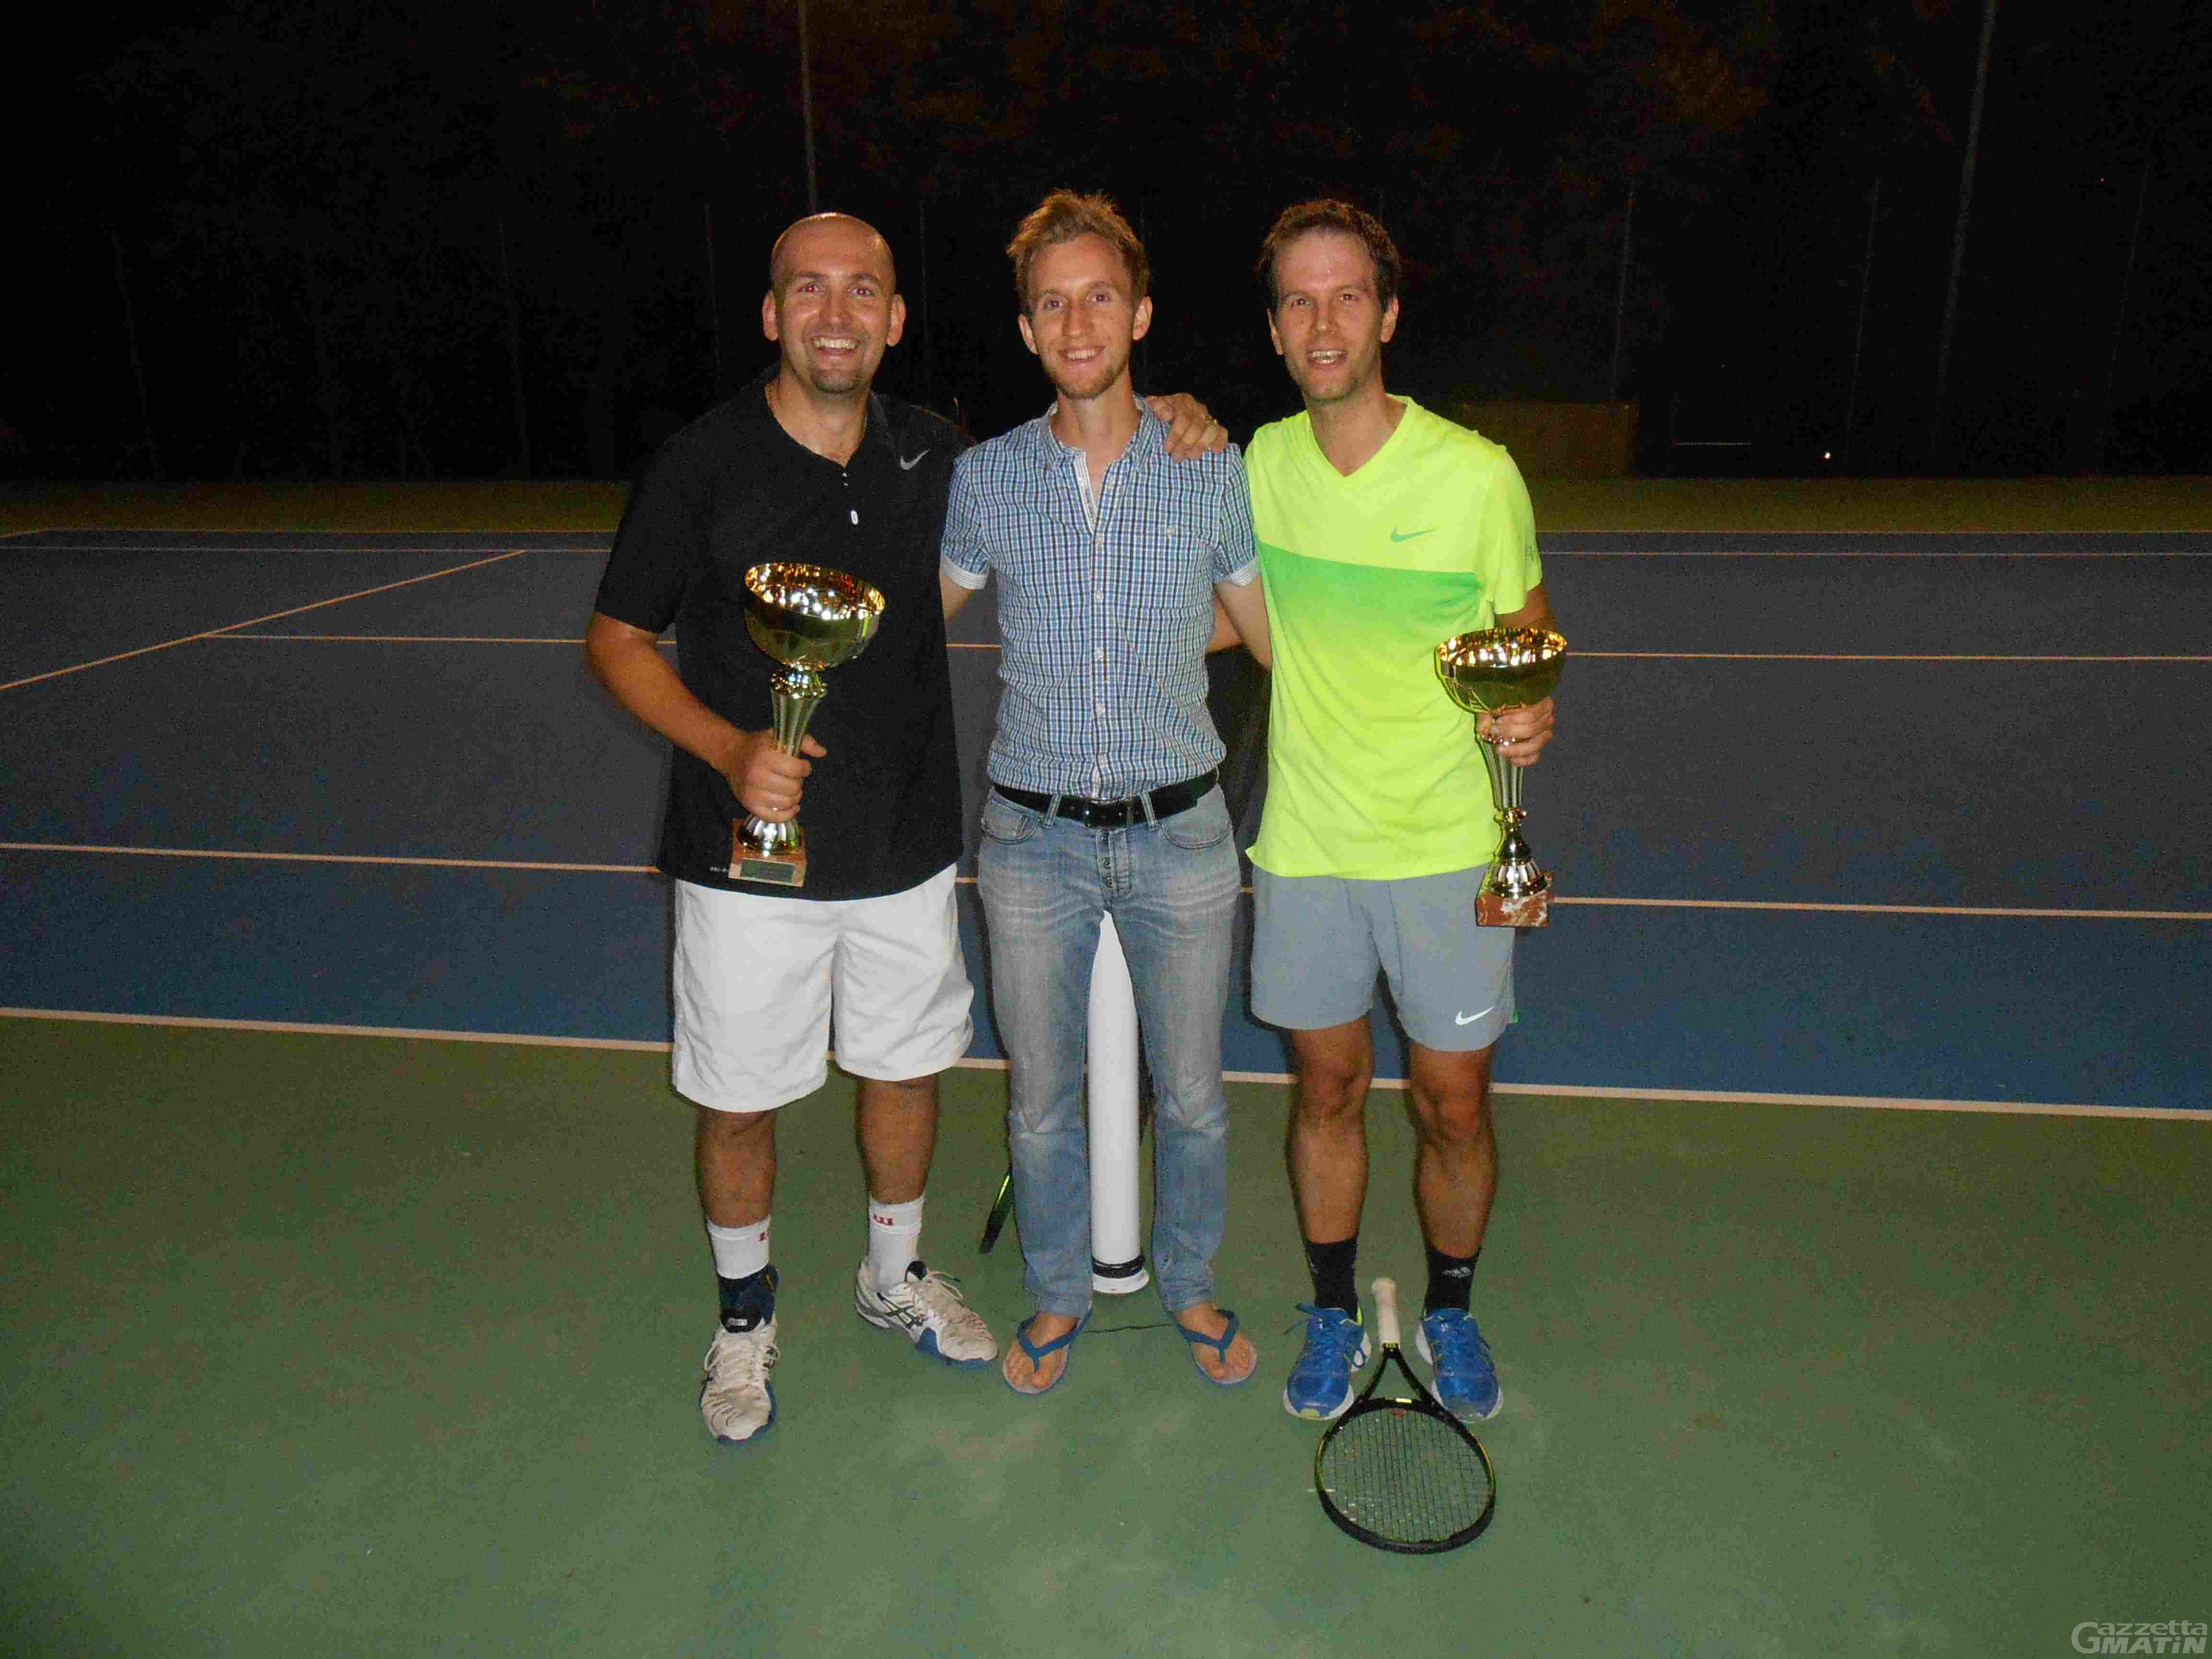 Tennis: Da Broi vince il Memorial Marquis